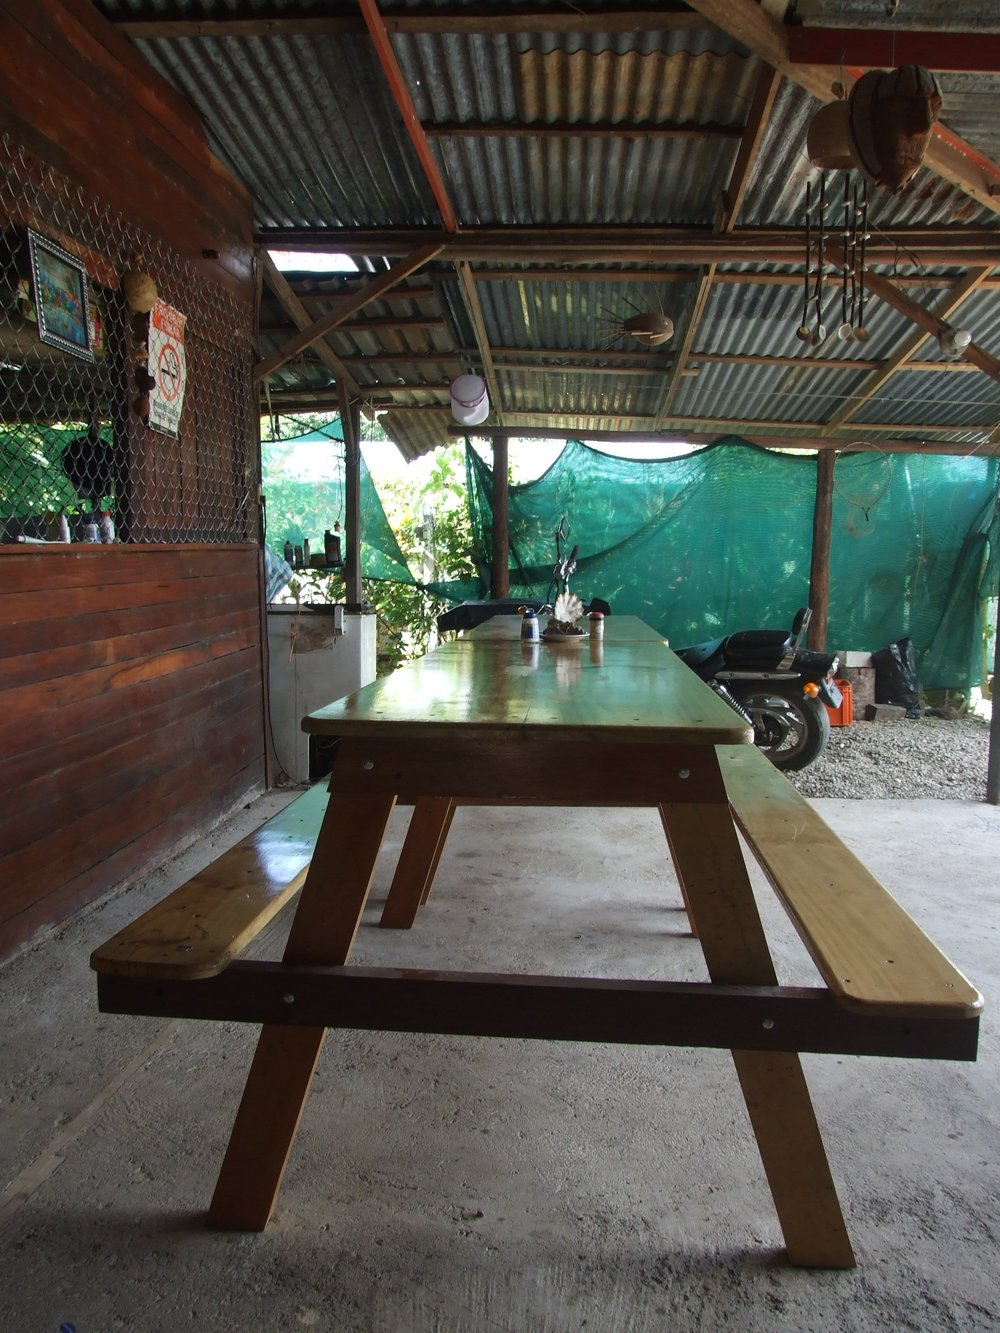 mesas para comer manawada.JPG